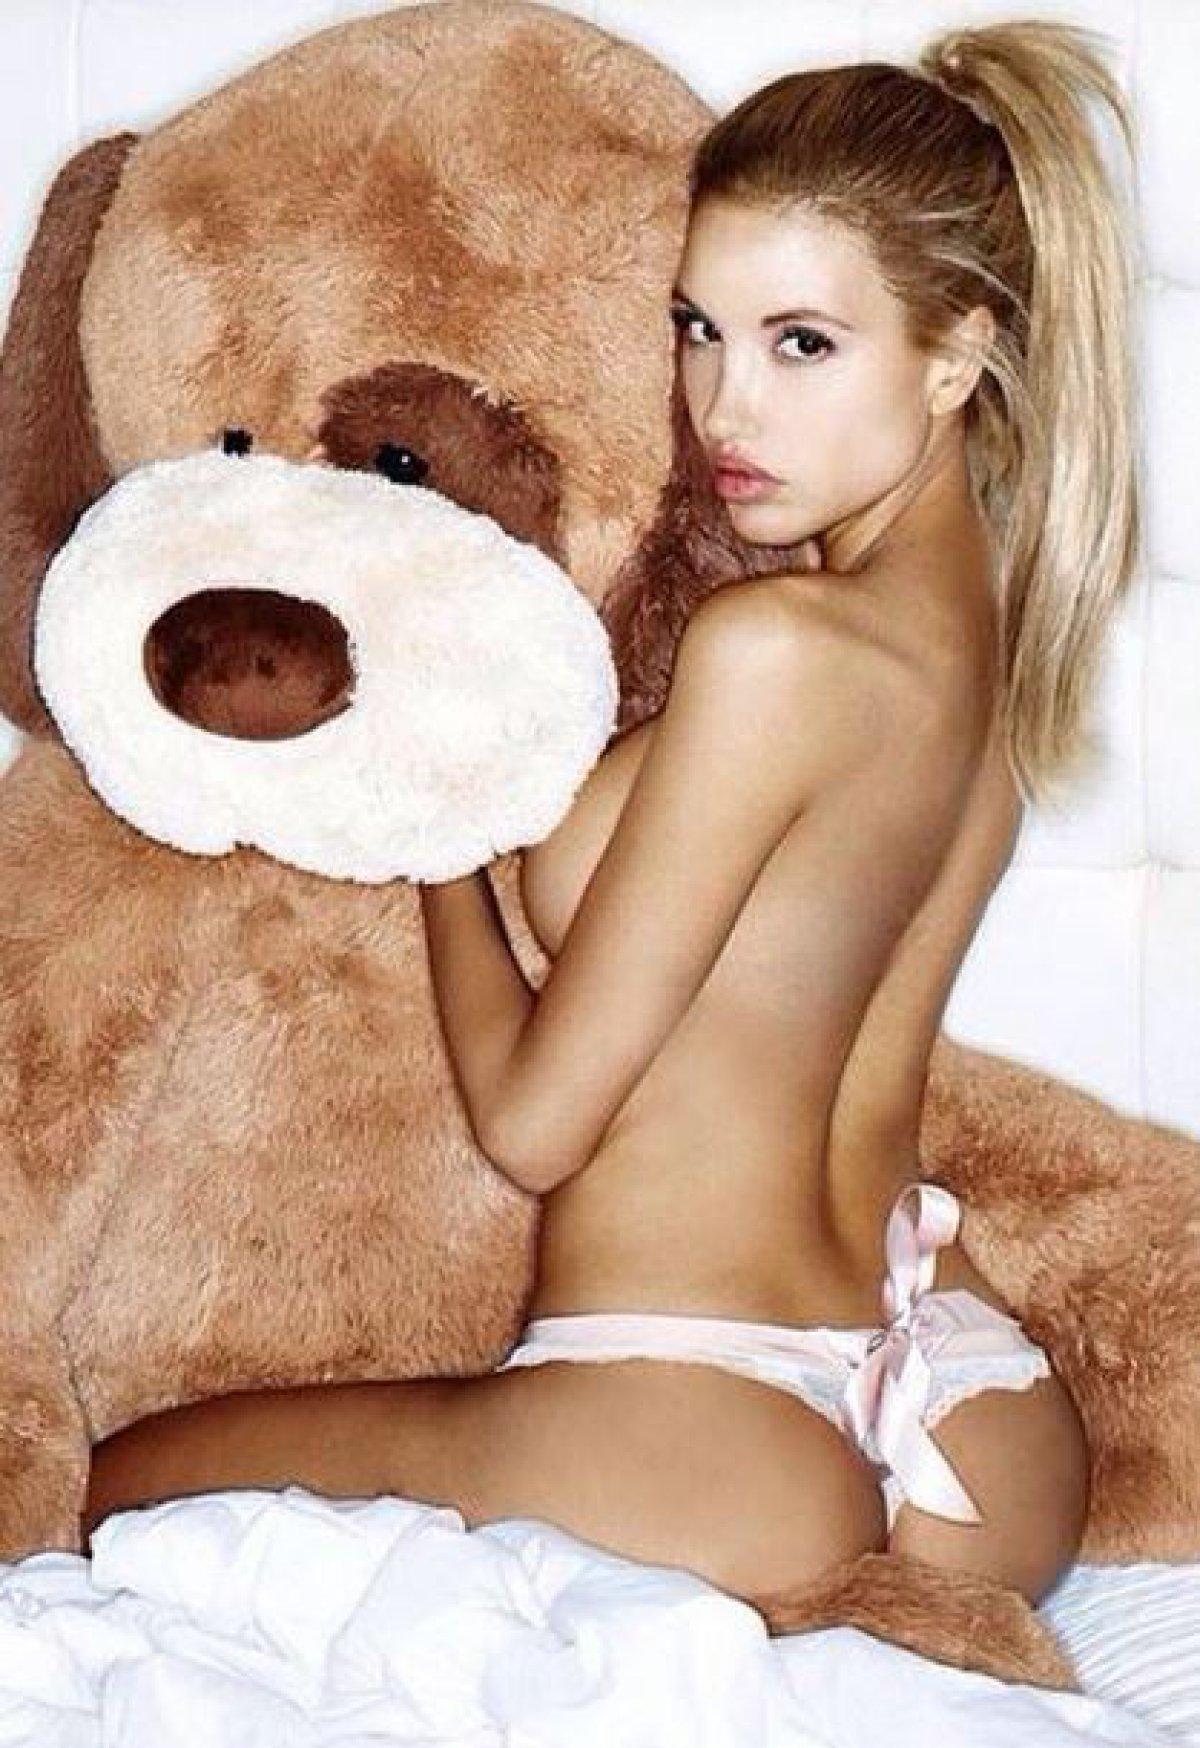 fotos para putas paginas chicas sexis